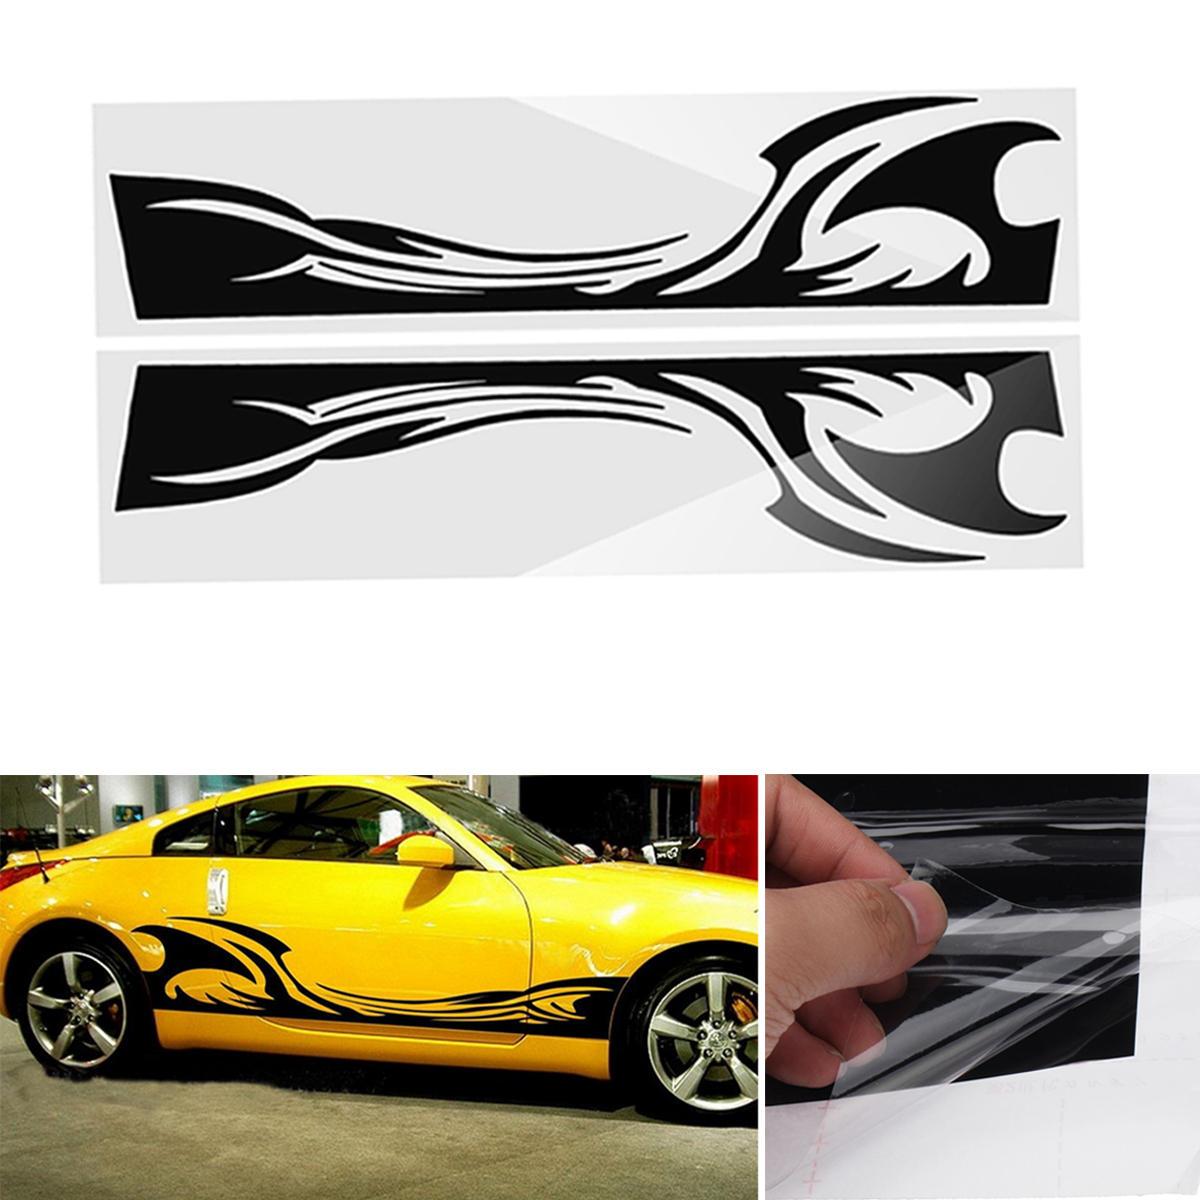 210cm*38cm Sports Stripe Pattern Style Car Stickers Vinyl Decal for Race SUV Side Body